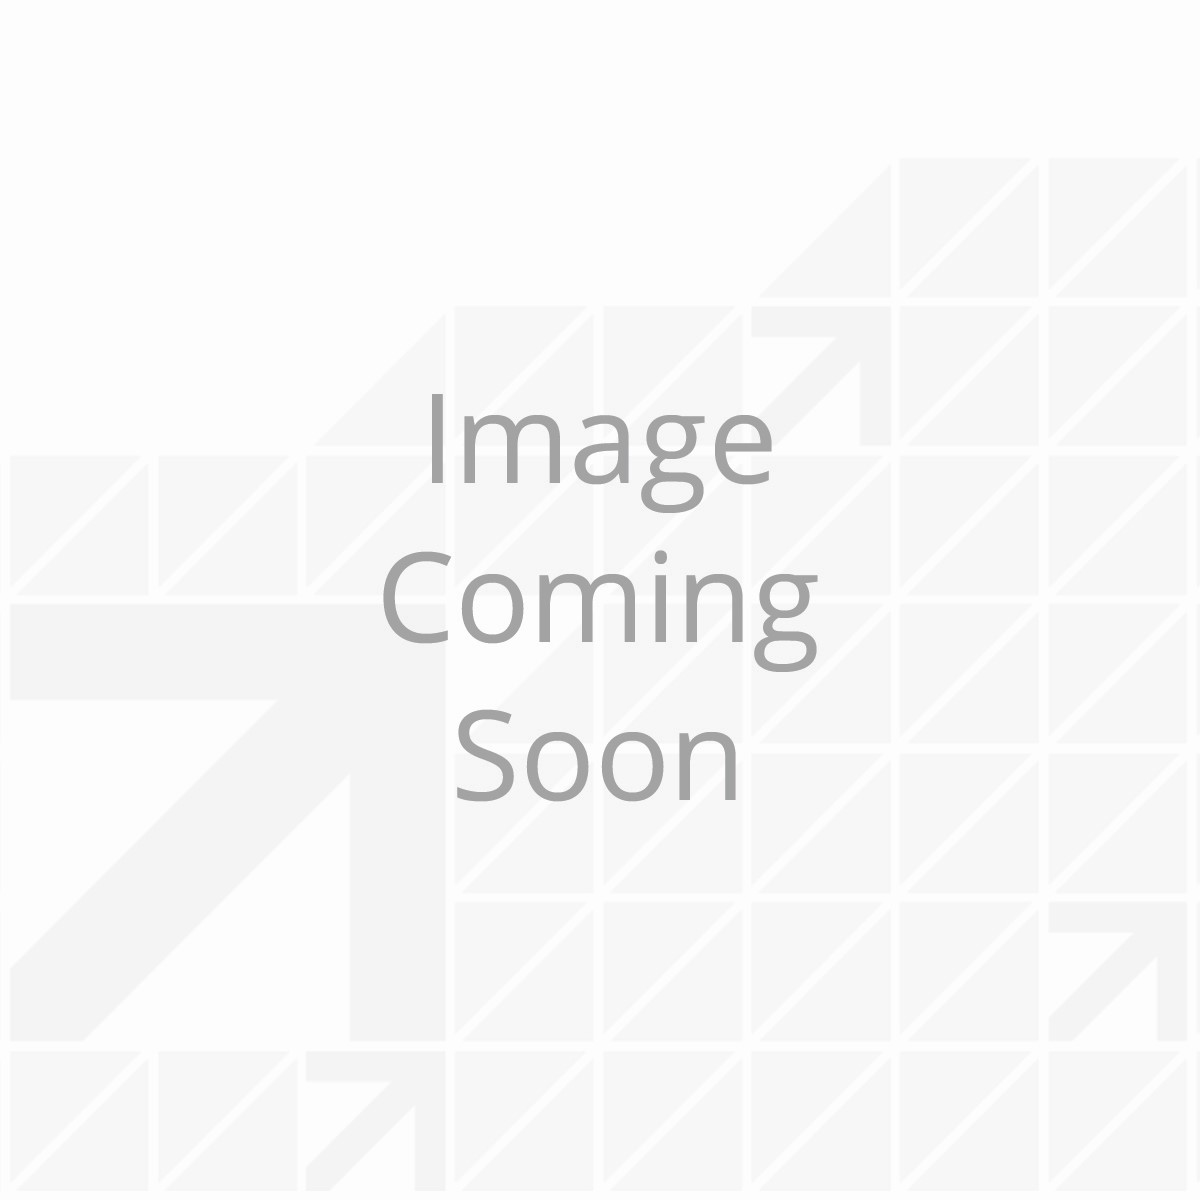 Trunnion Bar Weight Distribution Head Angle Adjustment Rod Kit